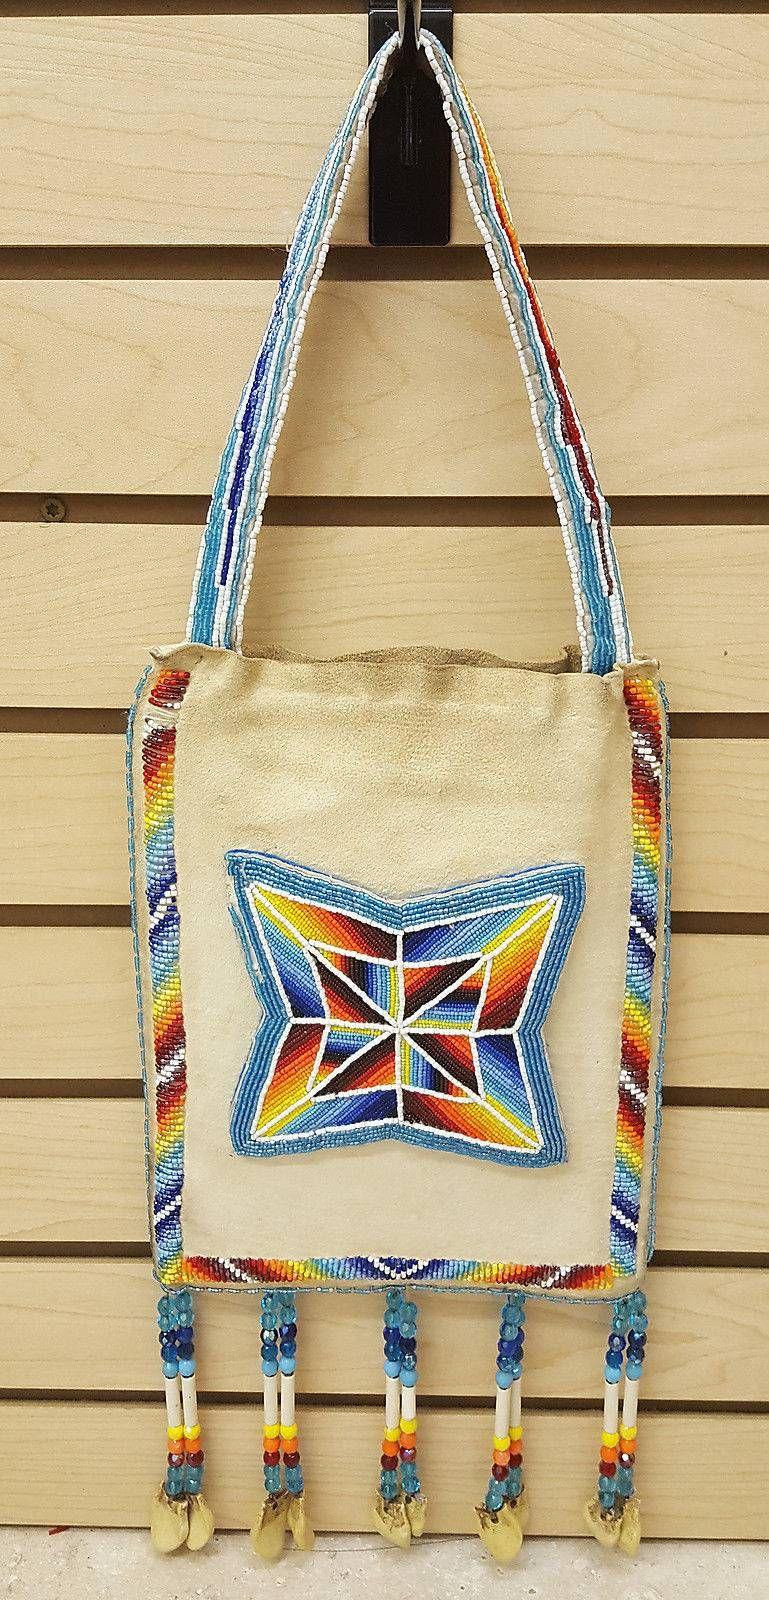 fee52725f1 NICE LARGE HAND CRAFTED CUT BEADED NATIVE AMERICAN INDIAN BUCKSKIN  PURSE/BAG – eBay Find of the week.